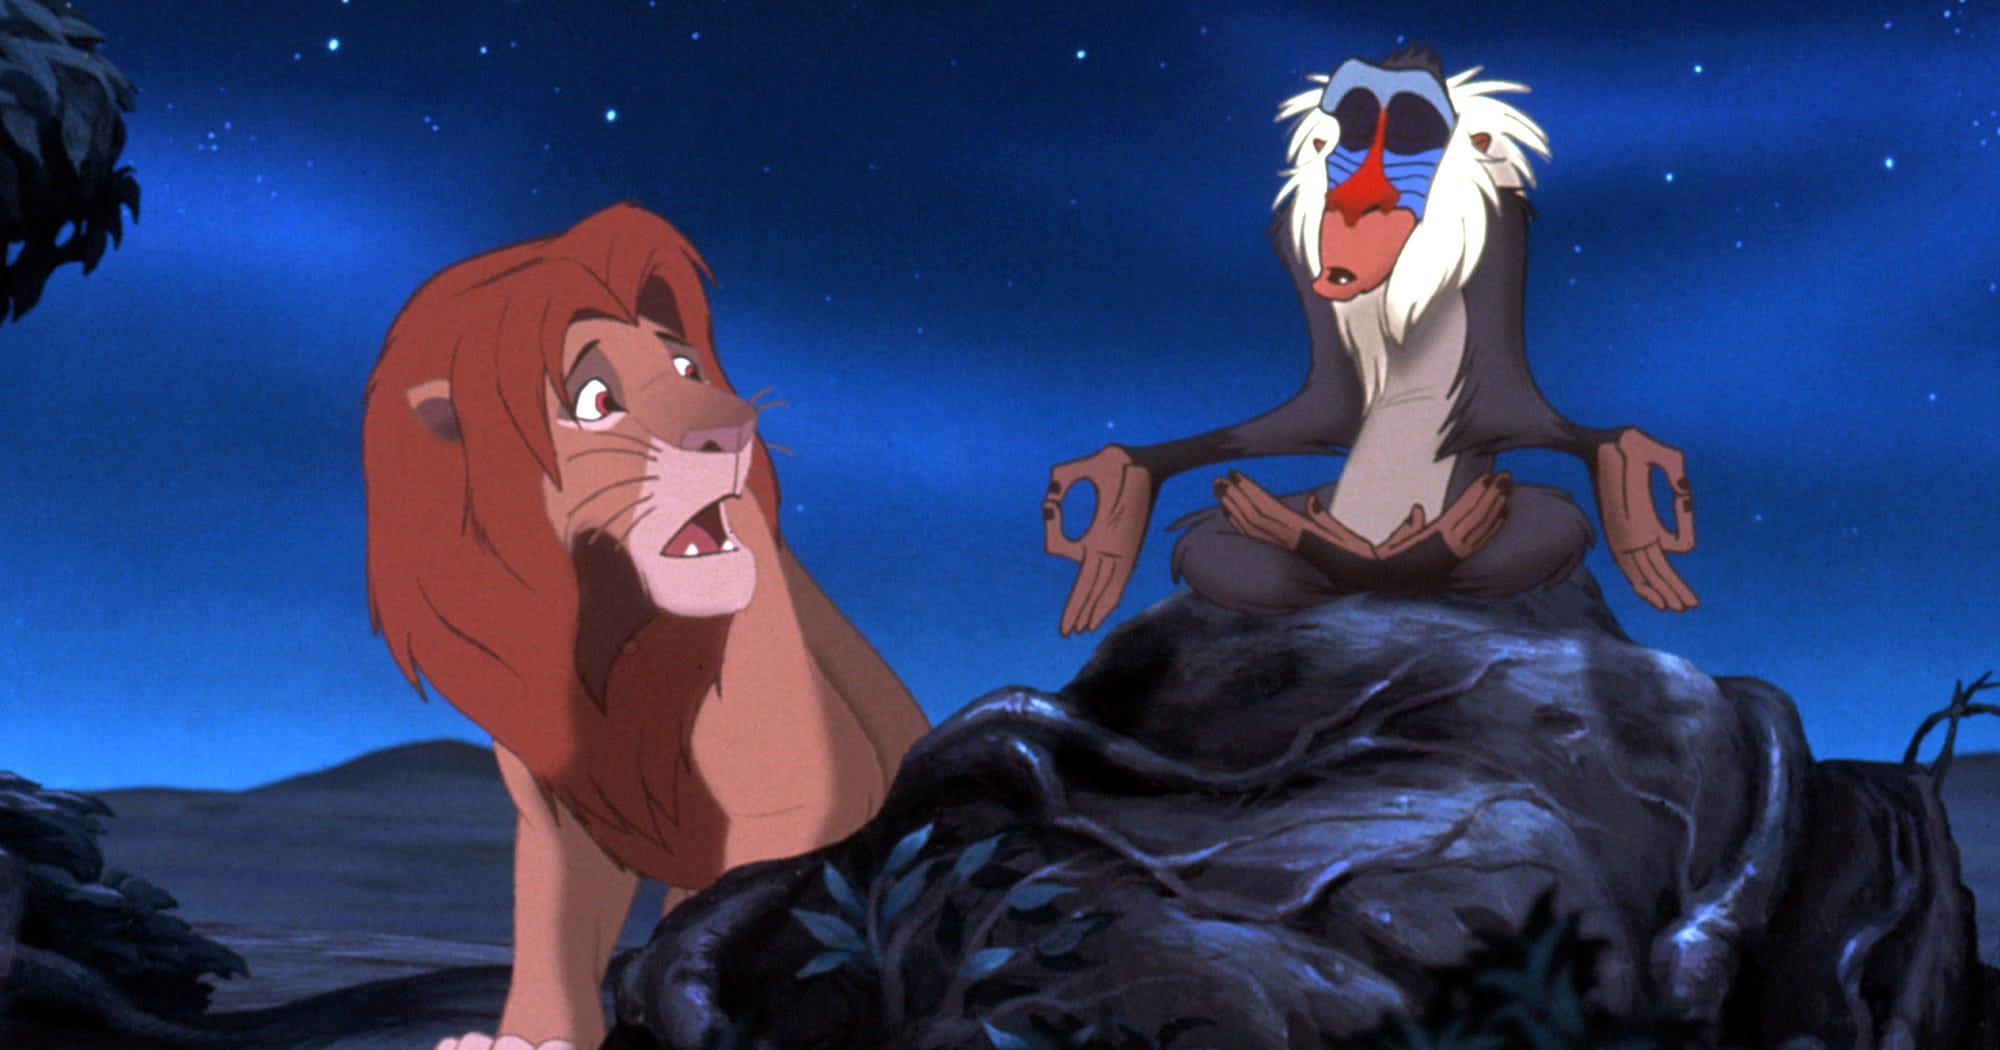 Saddest Disney Movies Ranked - The Lion King Frozen Up